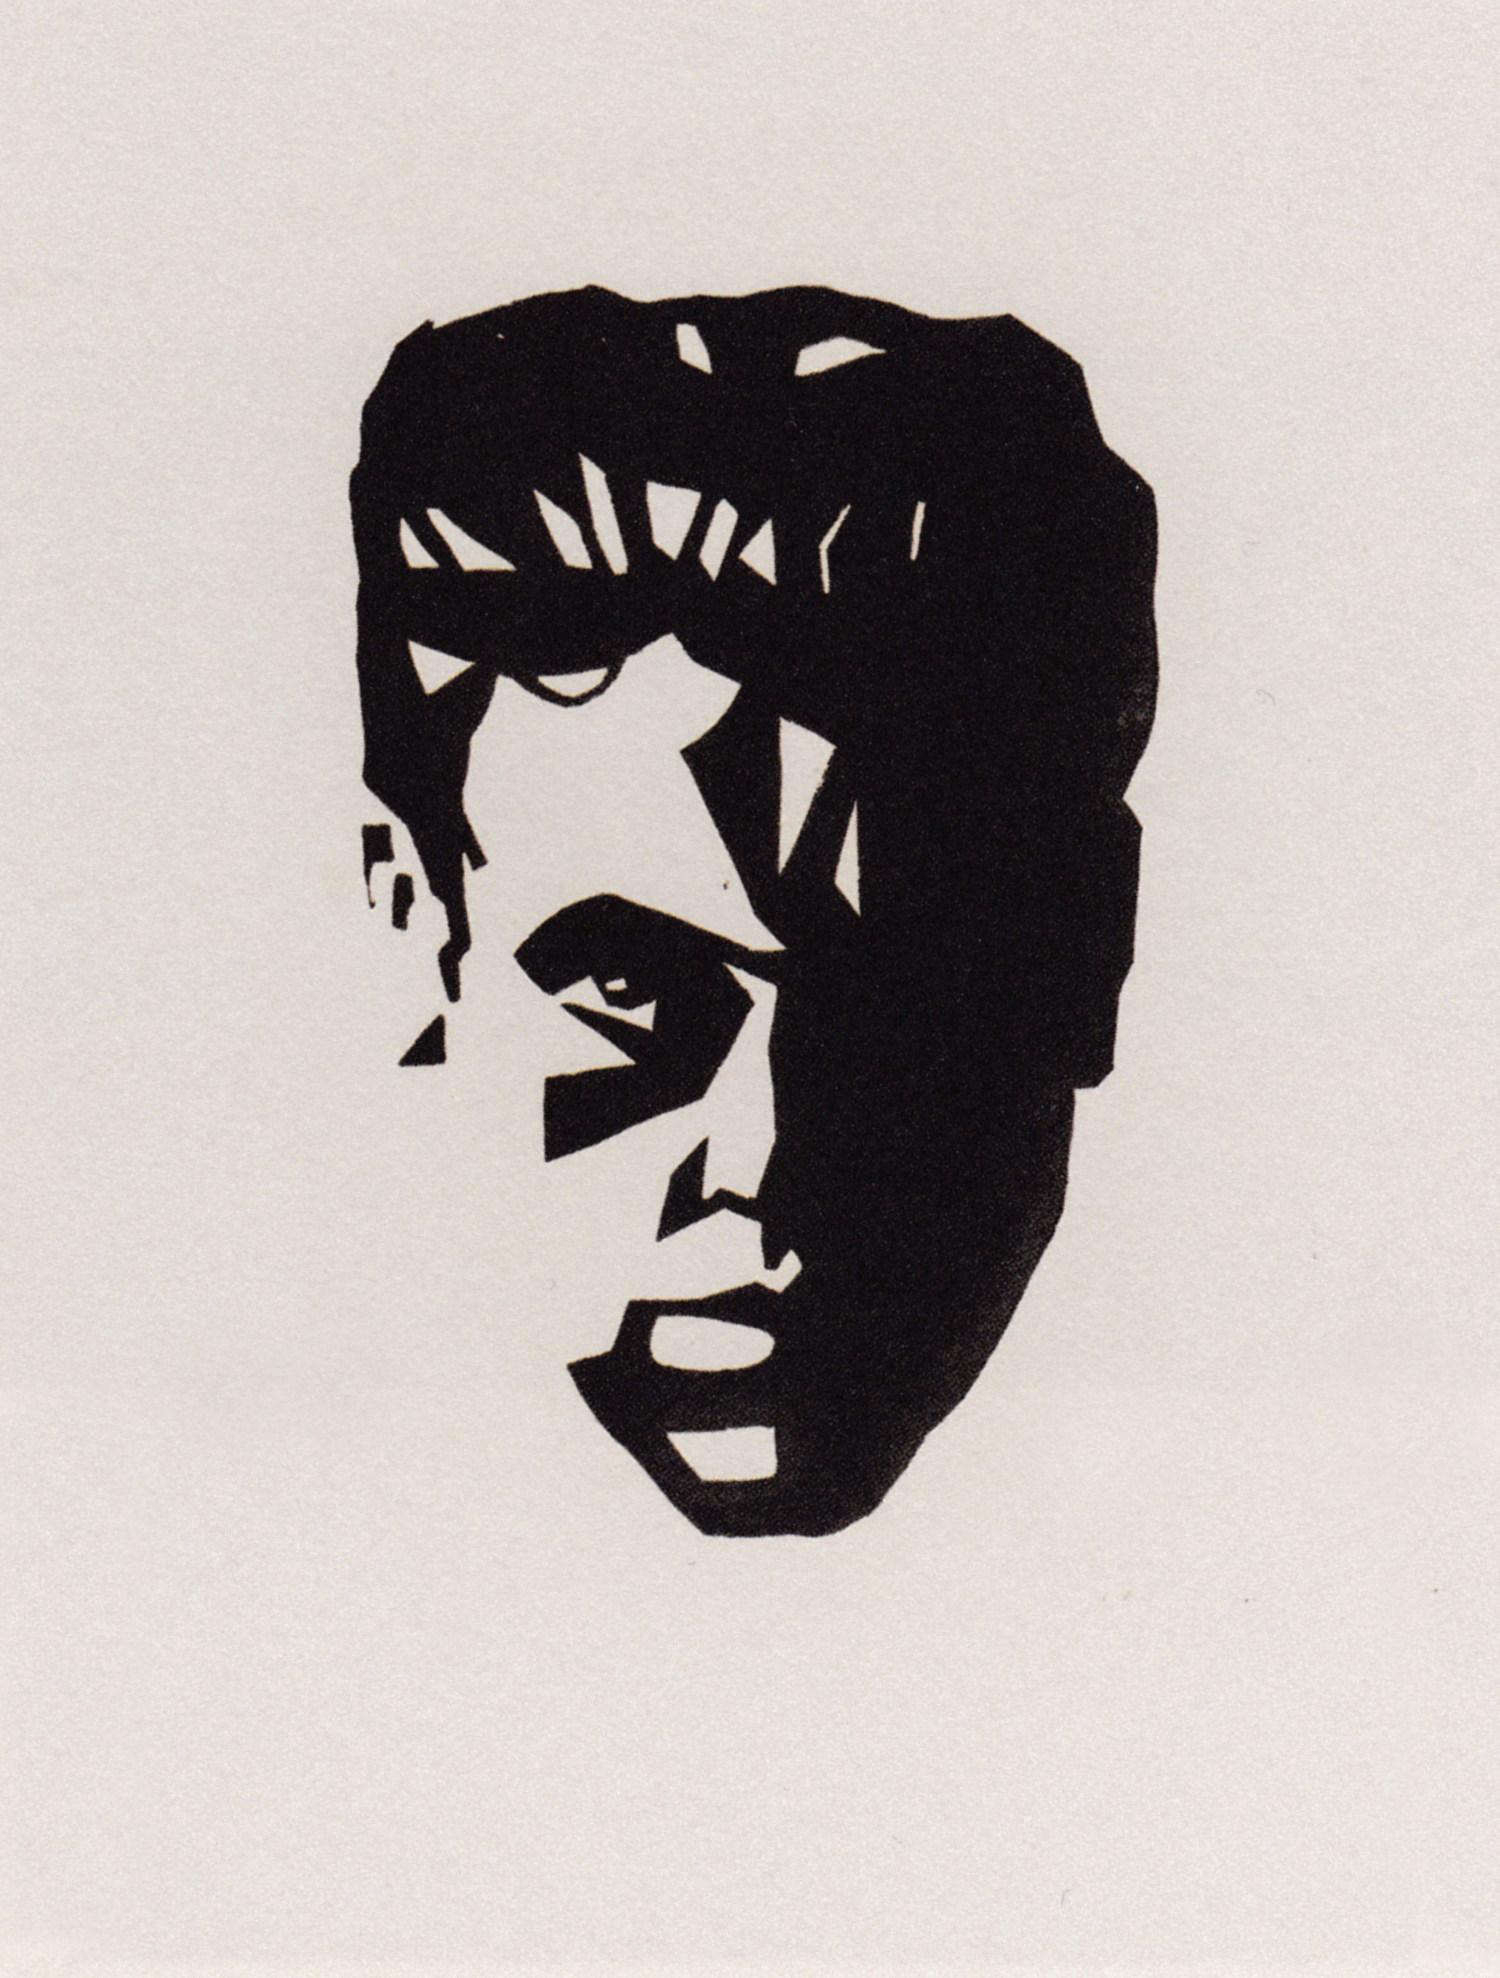 Victor Delhez Autoportrait linogravure artiste belge